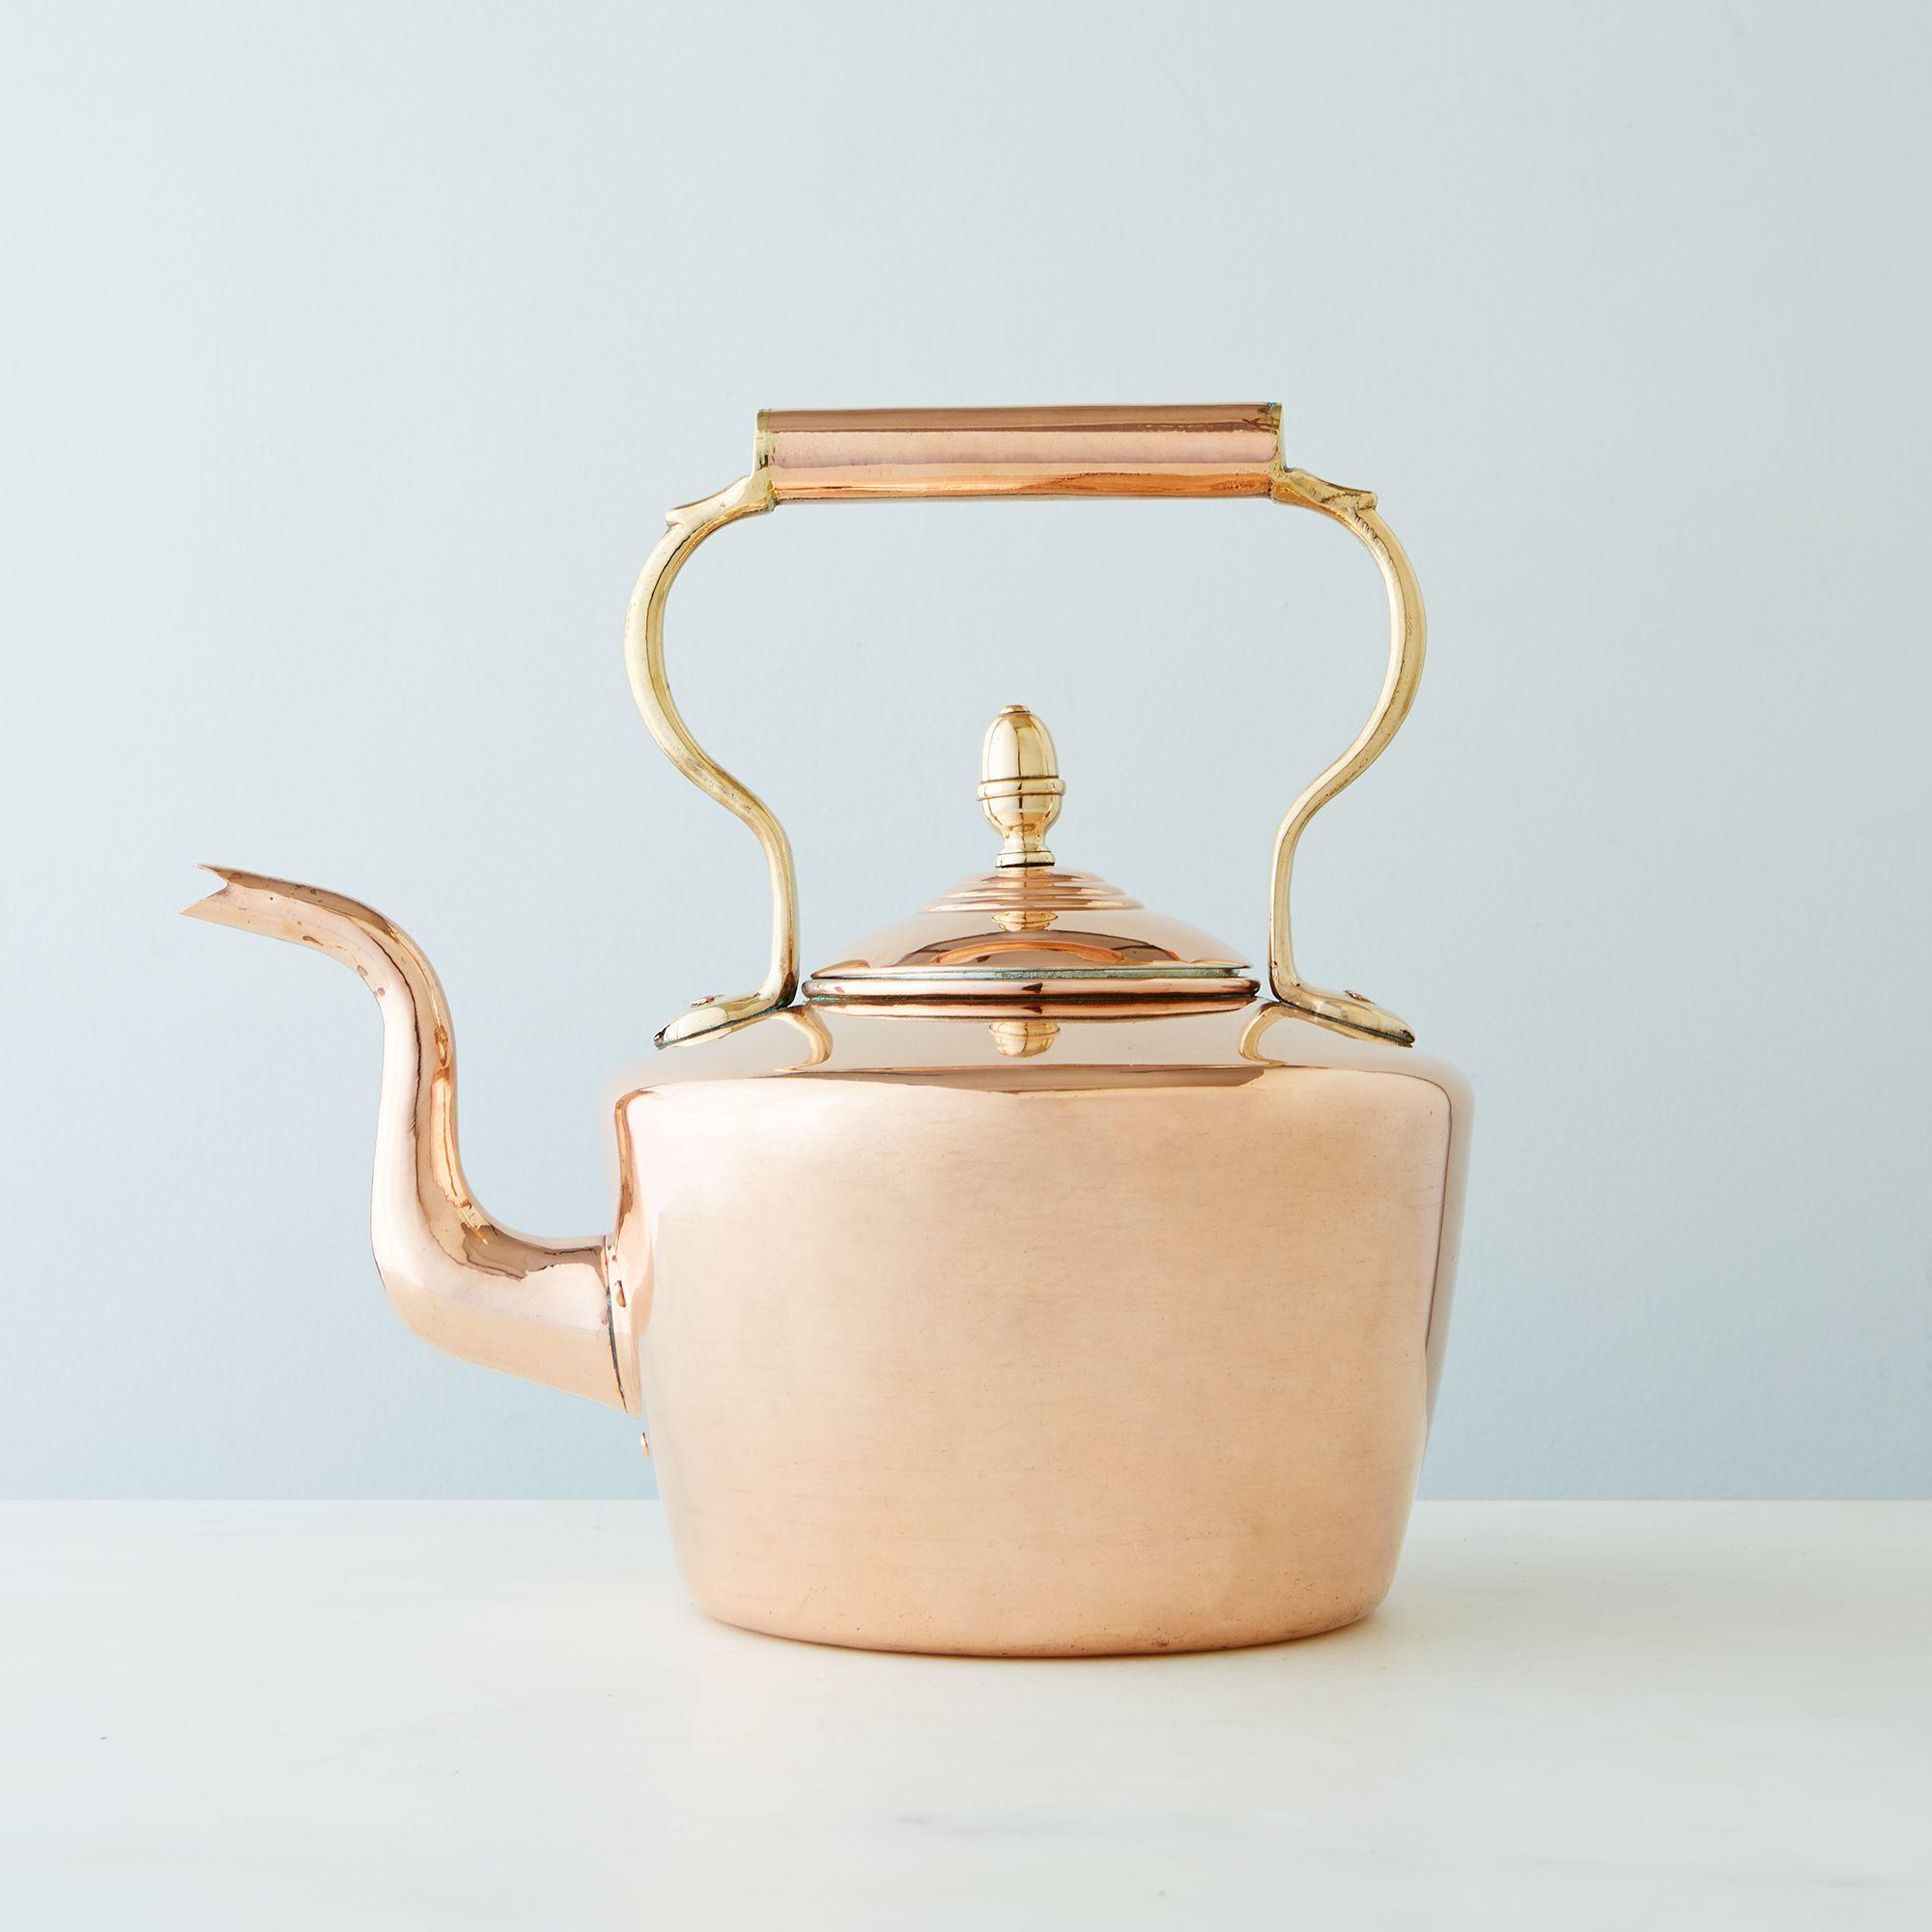 Da550138 0df2 49c8 b043 ef4794378ab6  coppermill kitchen vintage copper large round english tea kettle mid19th 5 provisions mark weinberg 18 09 14 0689 silo